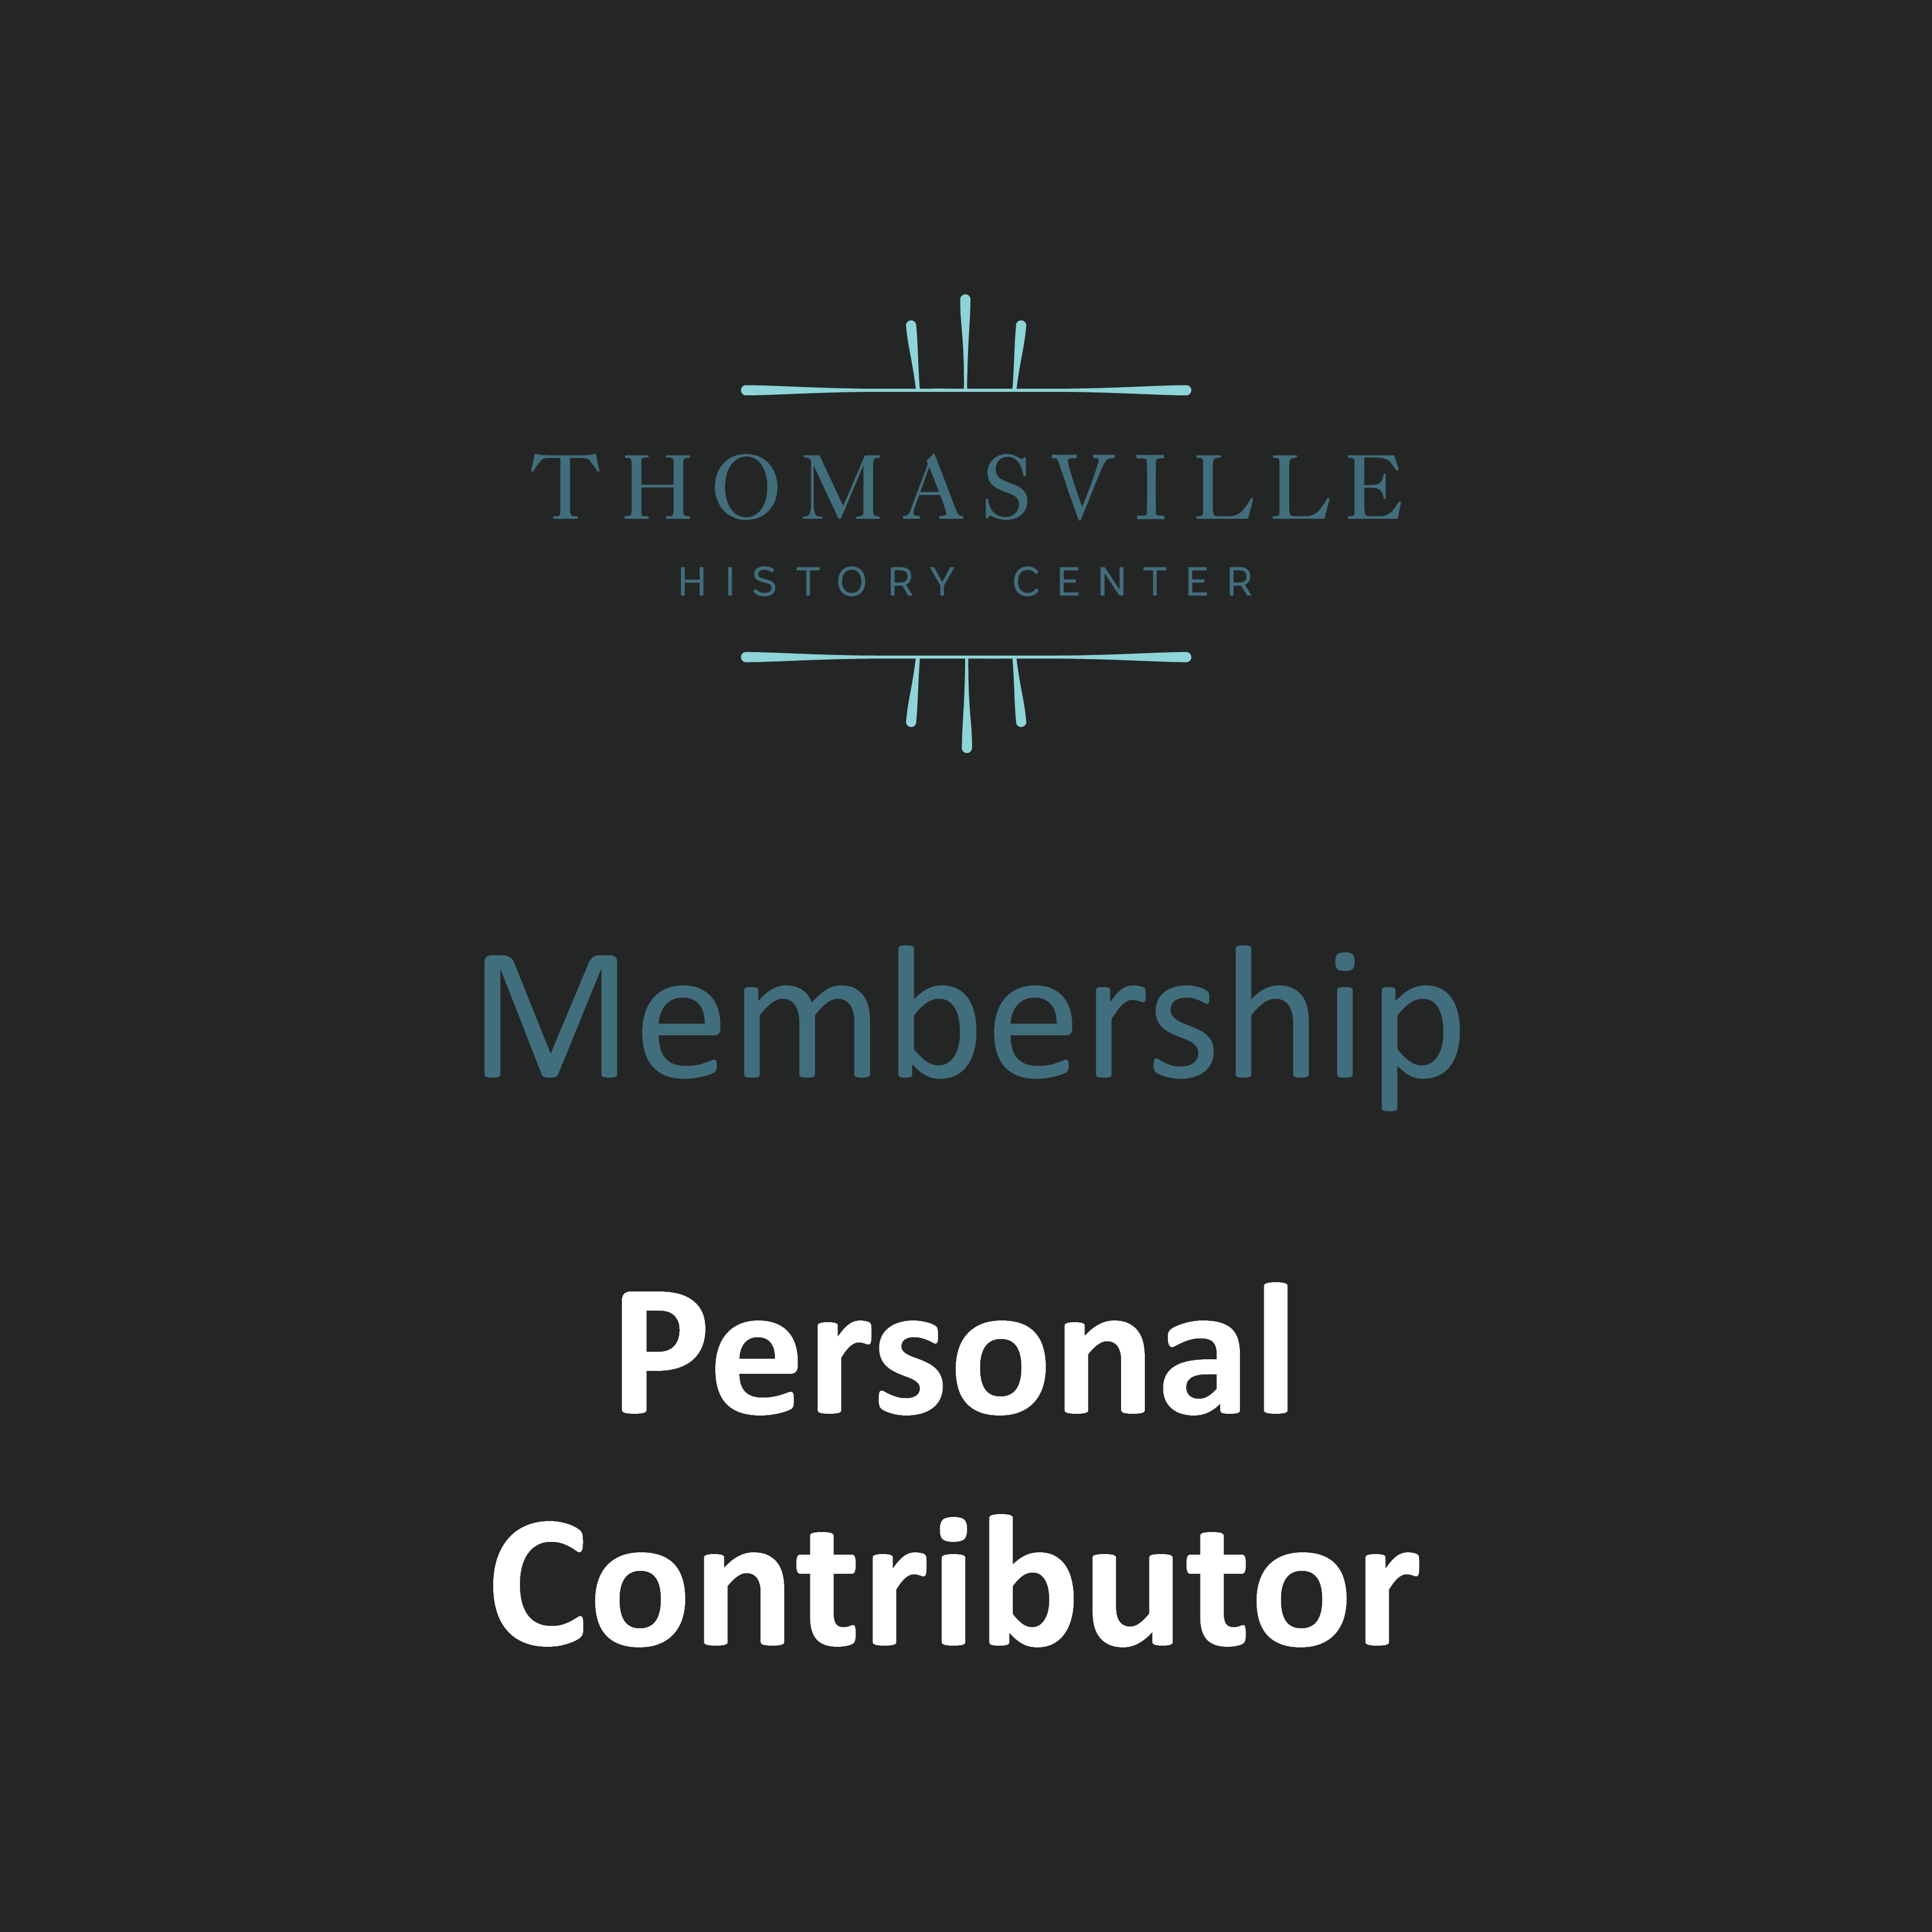 personal contributor